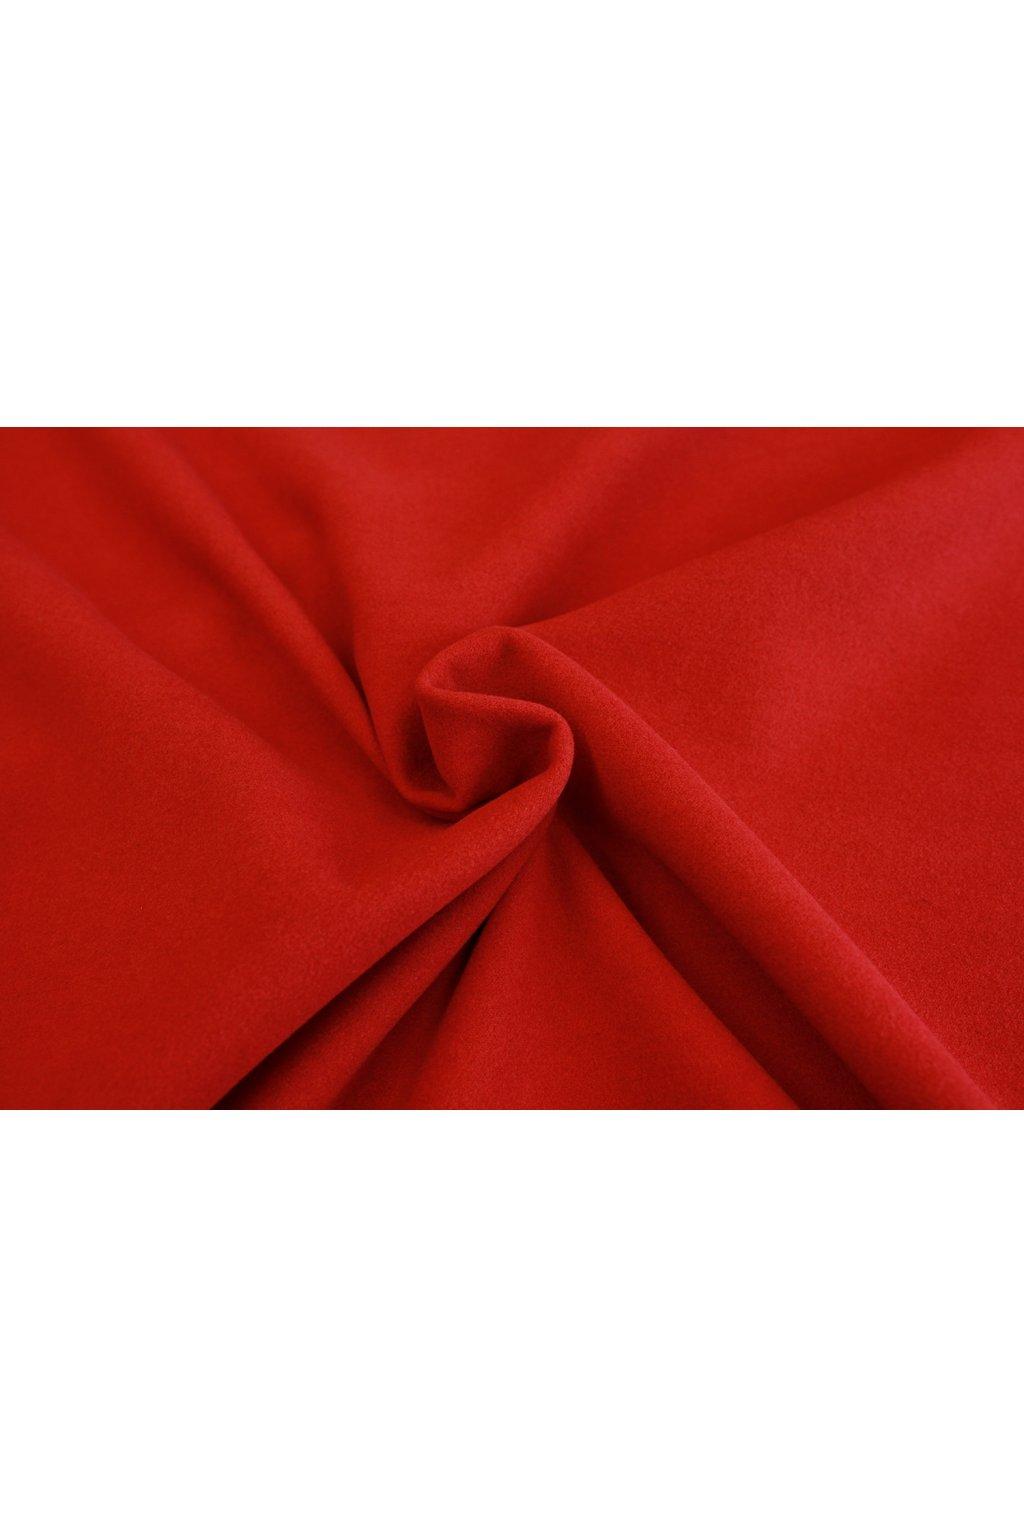 Flauš winter-red